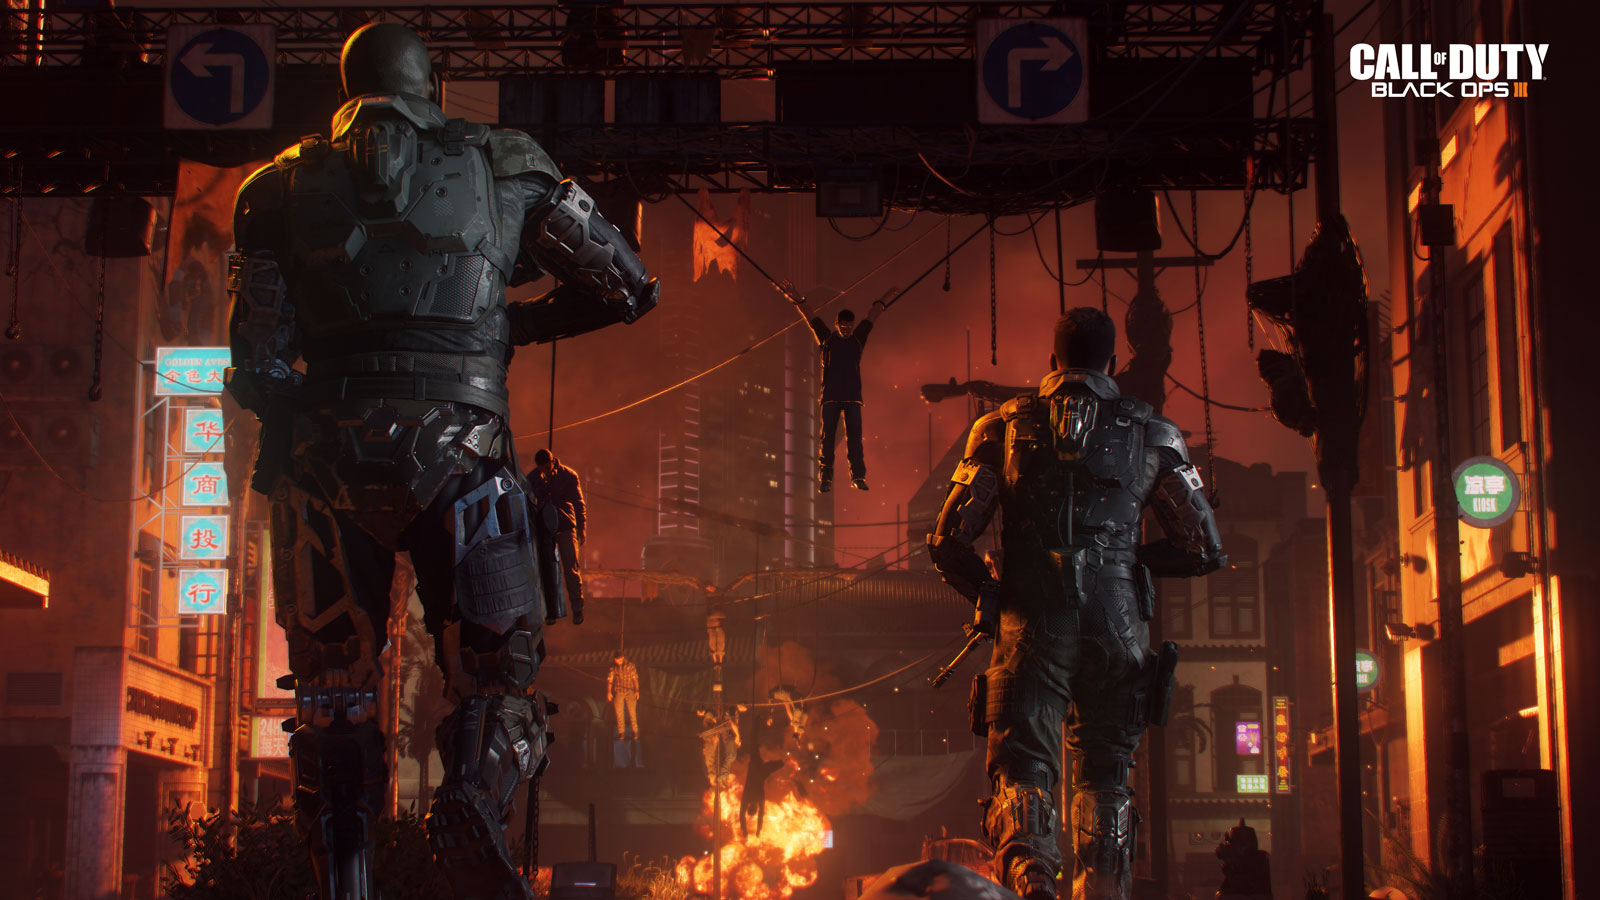 Call of Duty Black Ops III: Vengeance